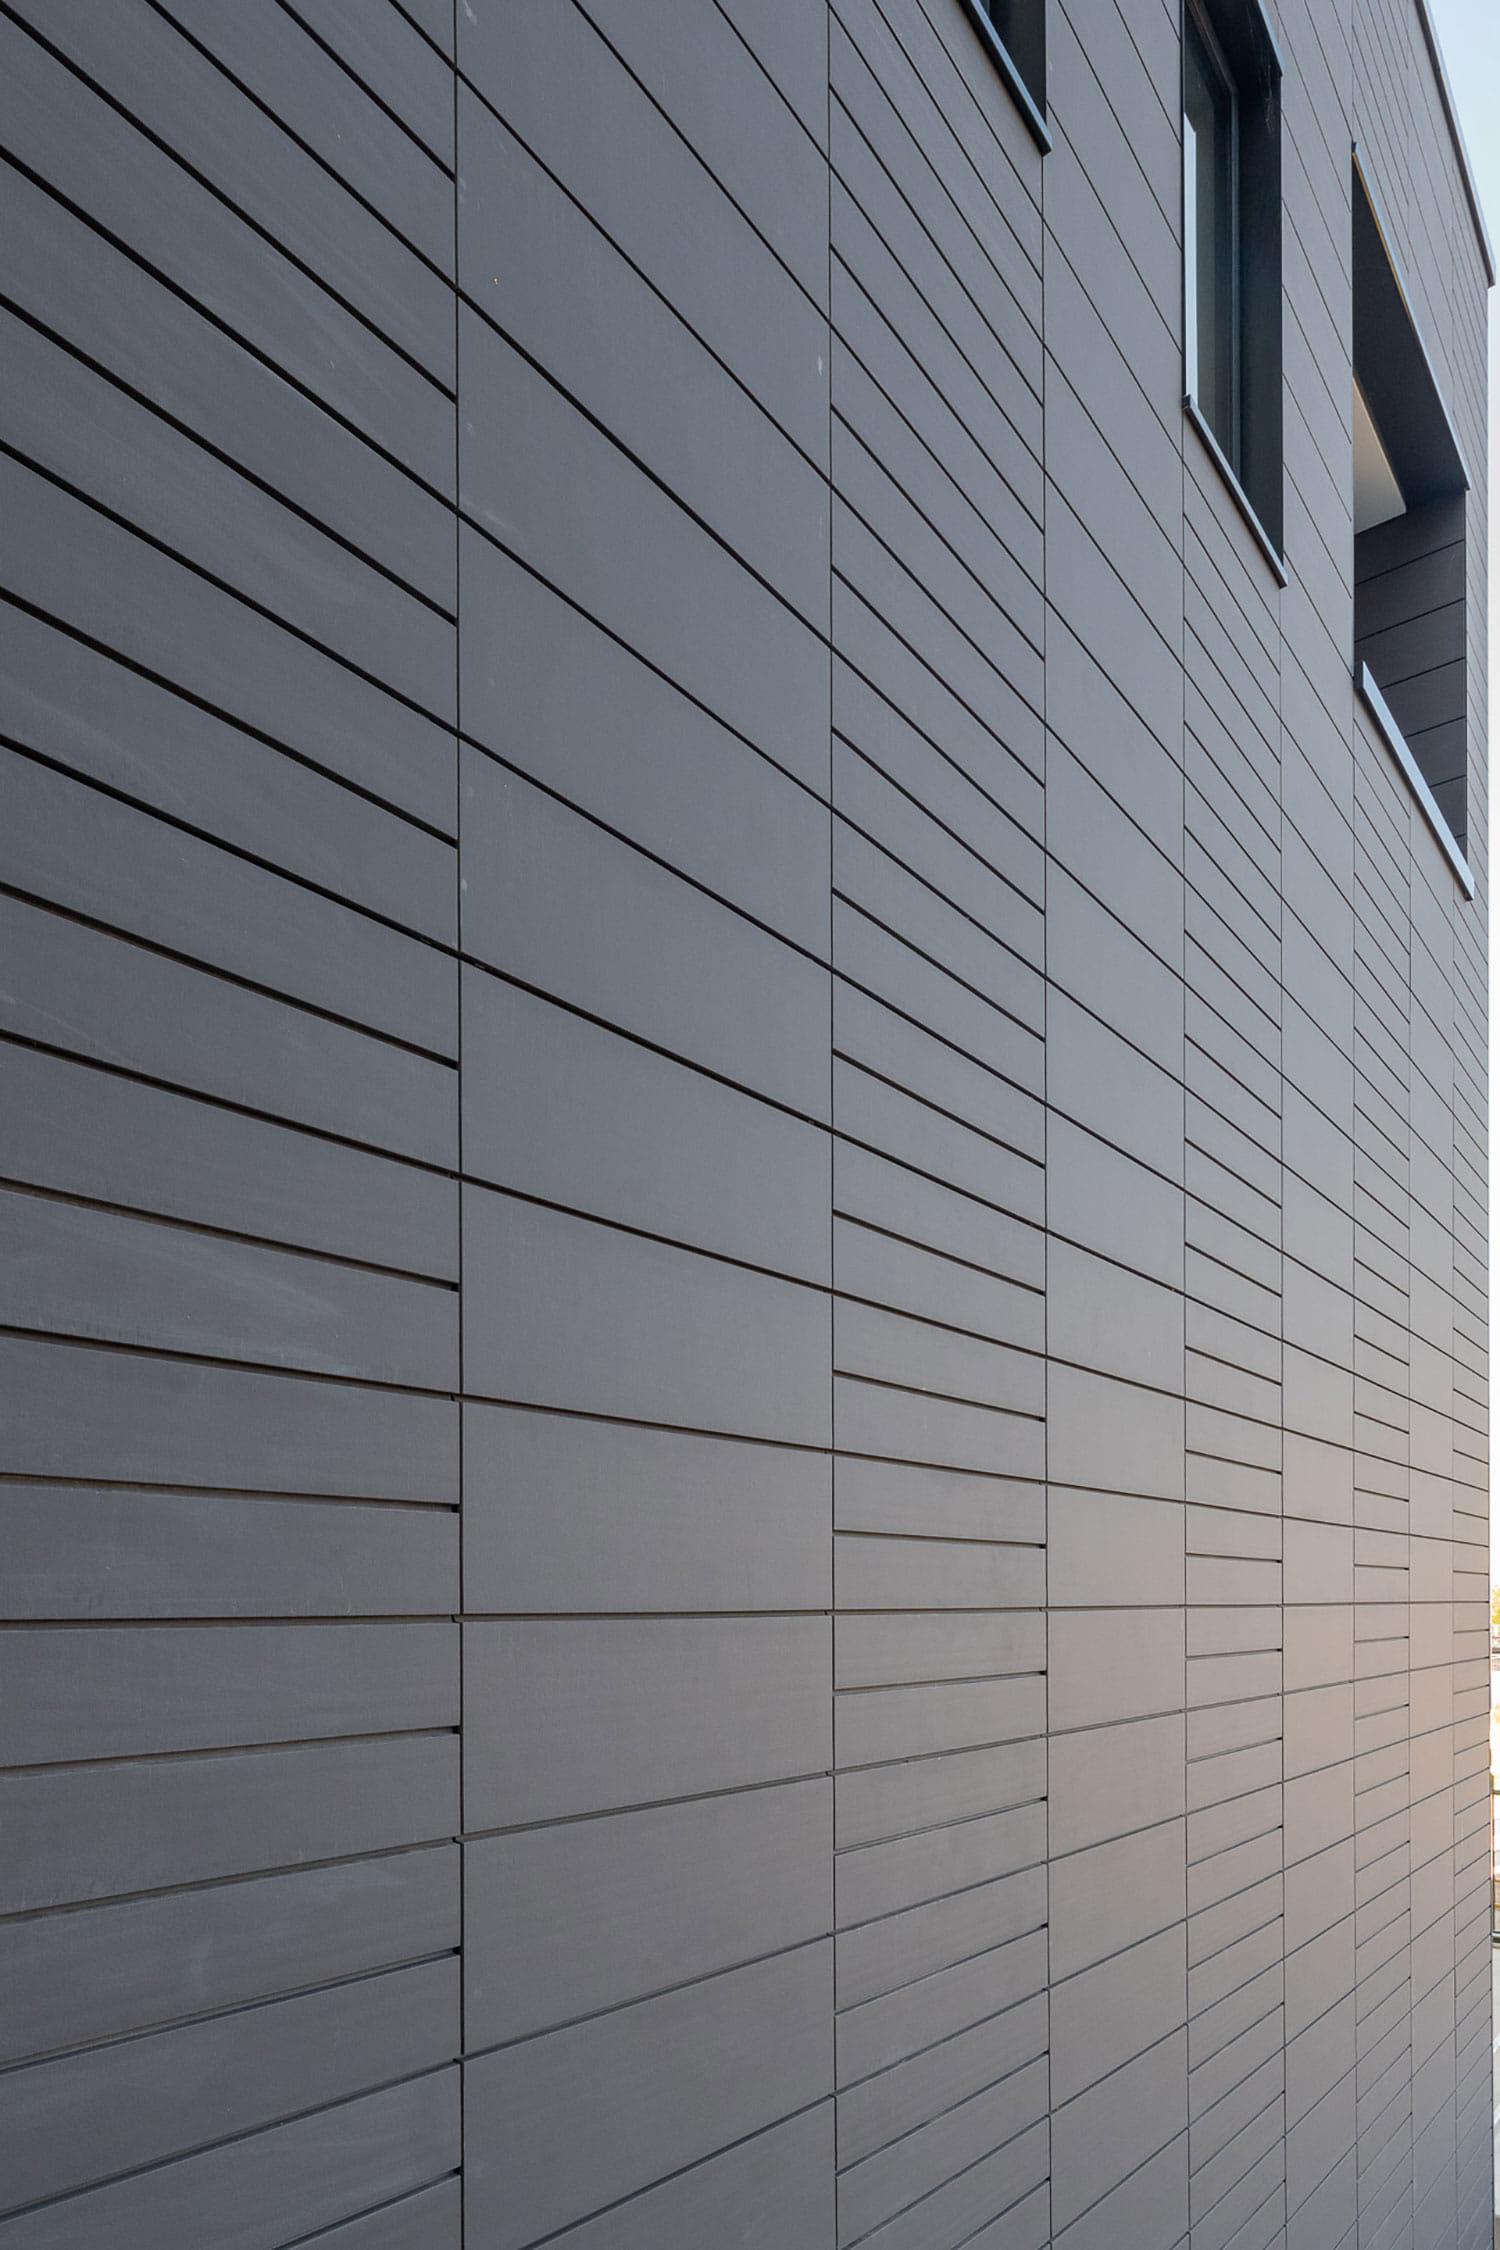 Detail van een muur met Argeton